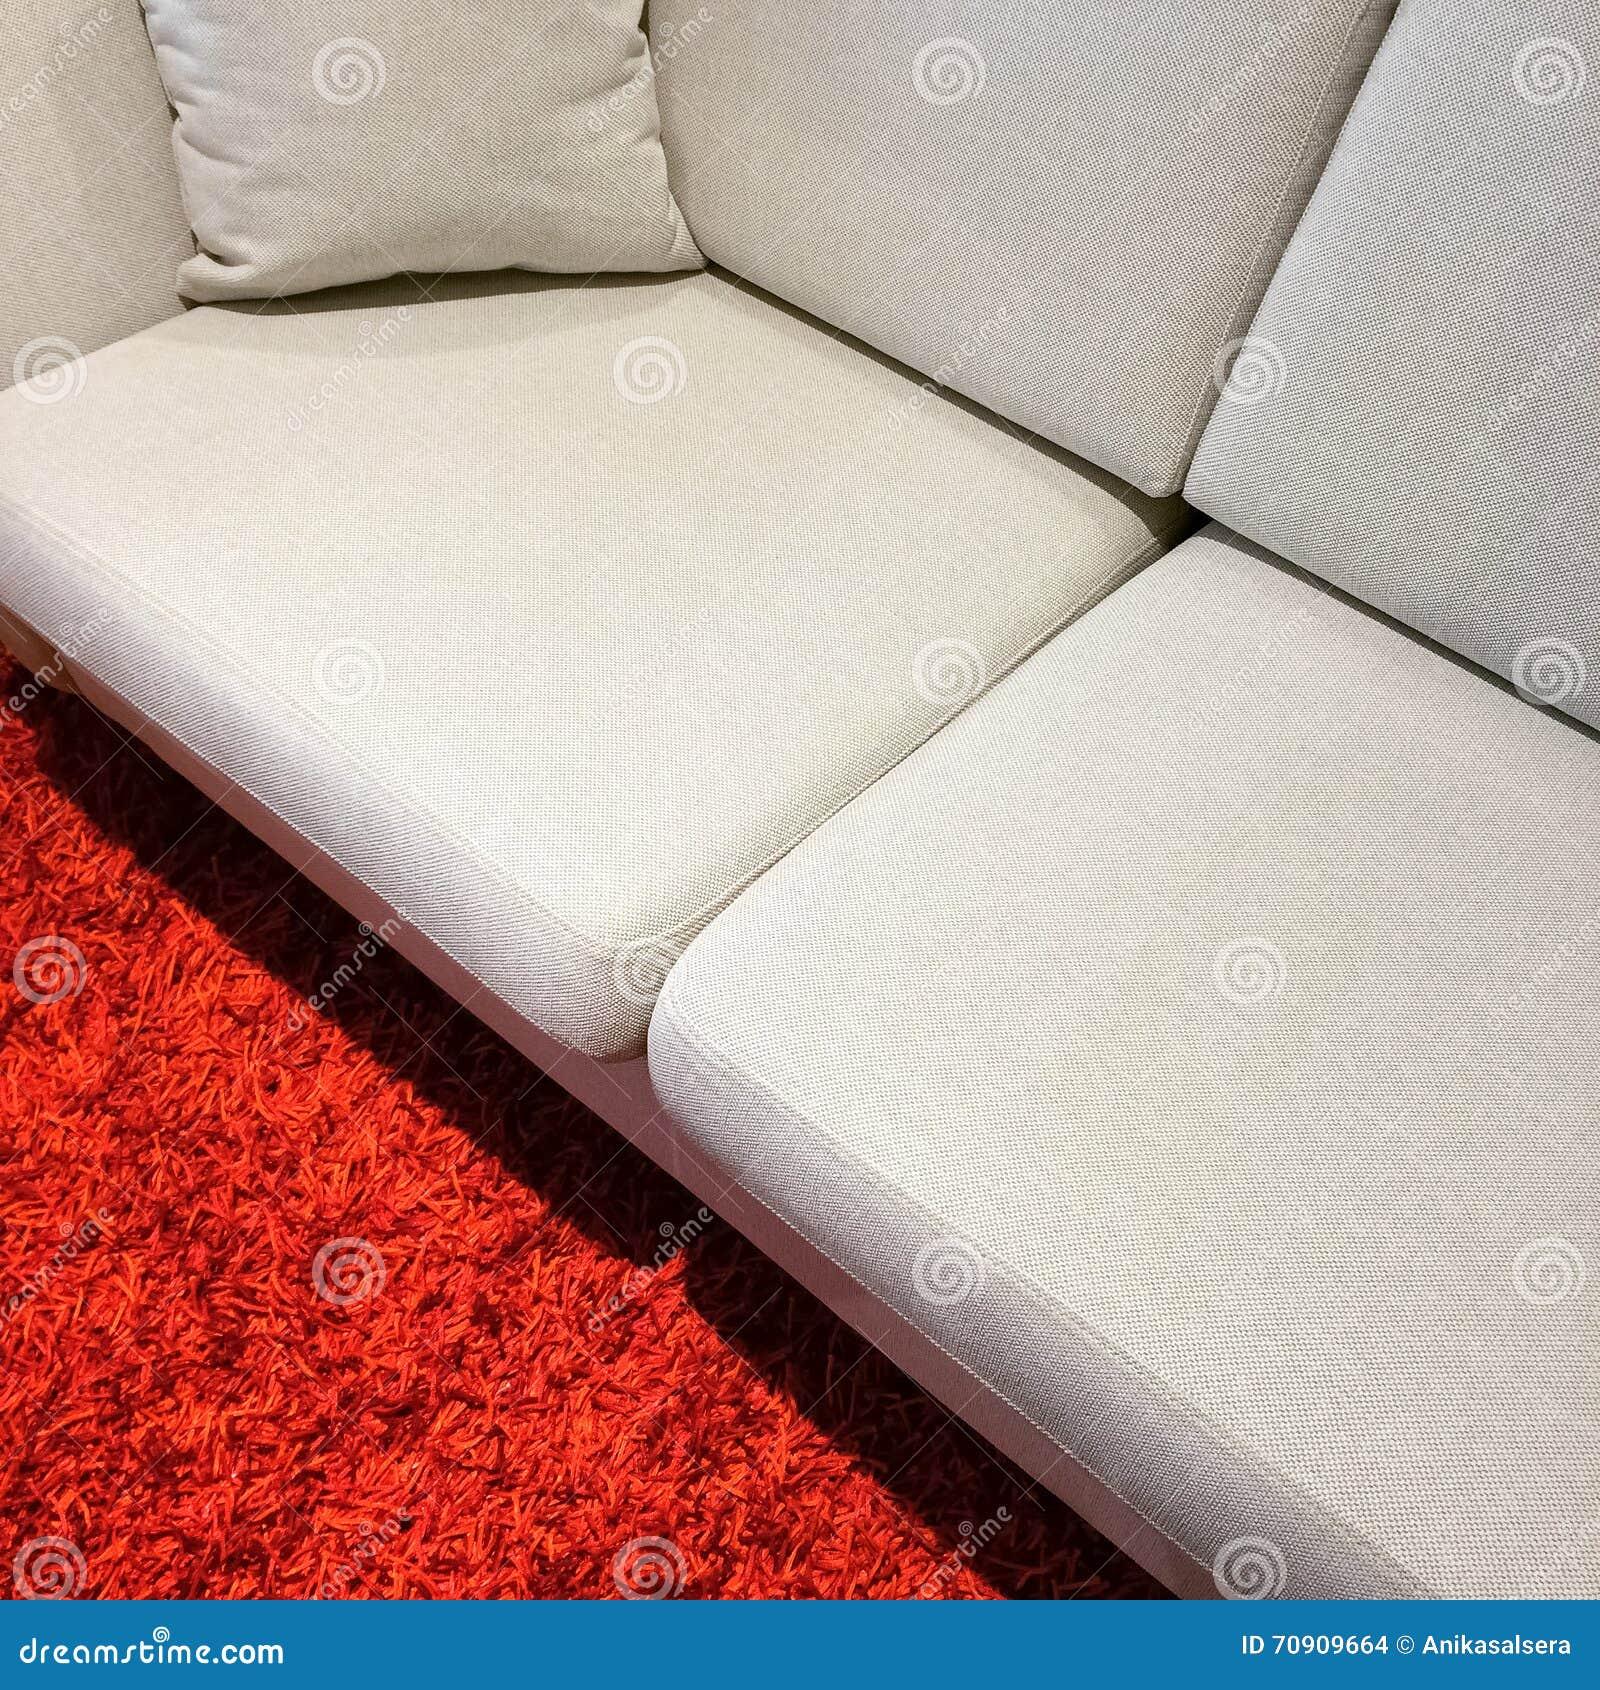 White Sofa On Red Carpet Stock Photo. Image Of Detail - 70909664